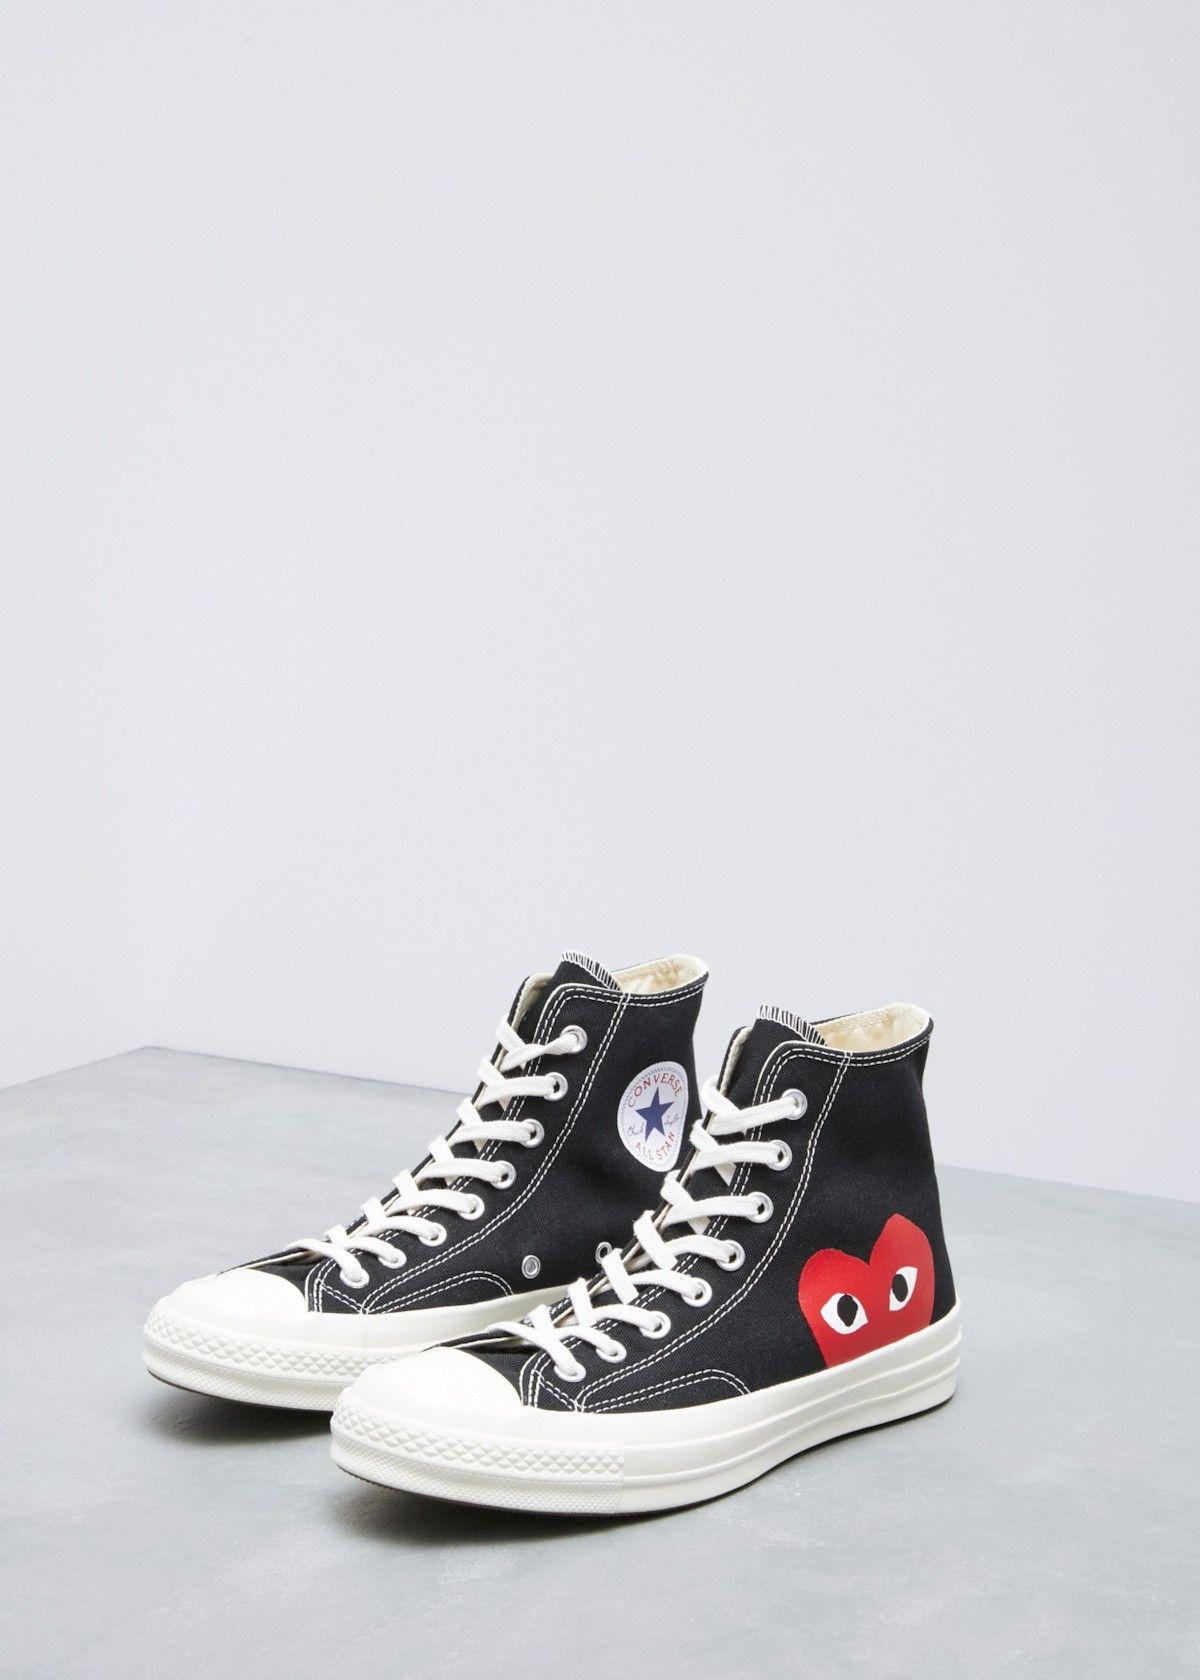 black high top cdg converse